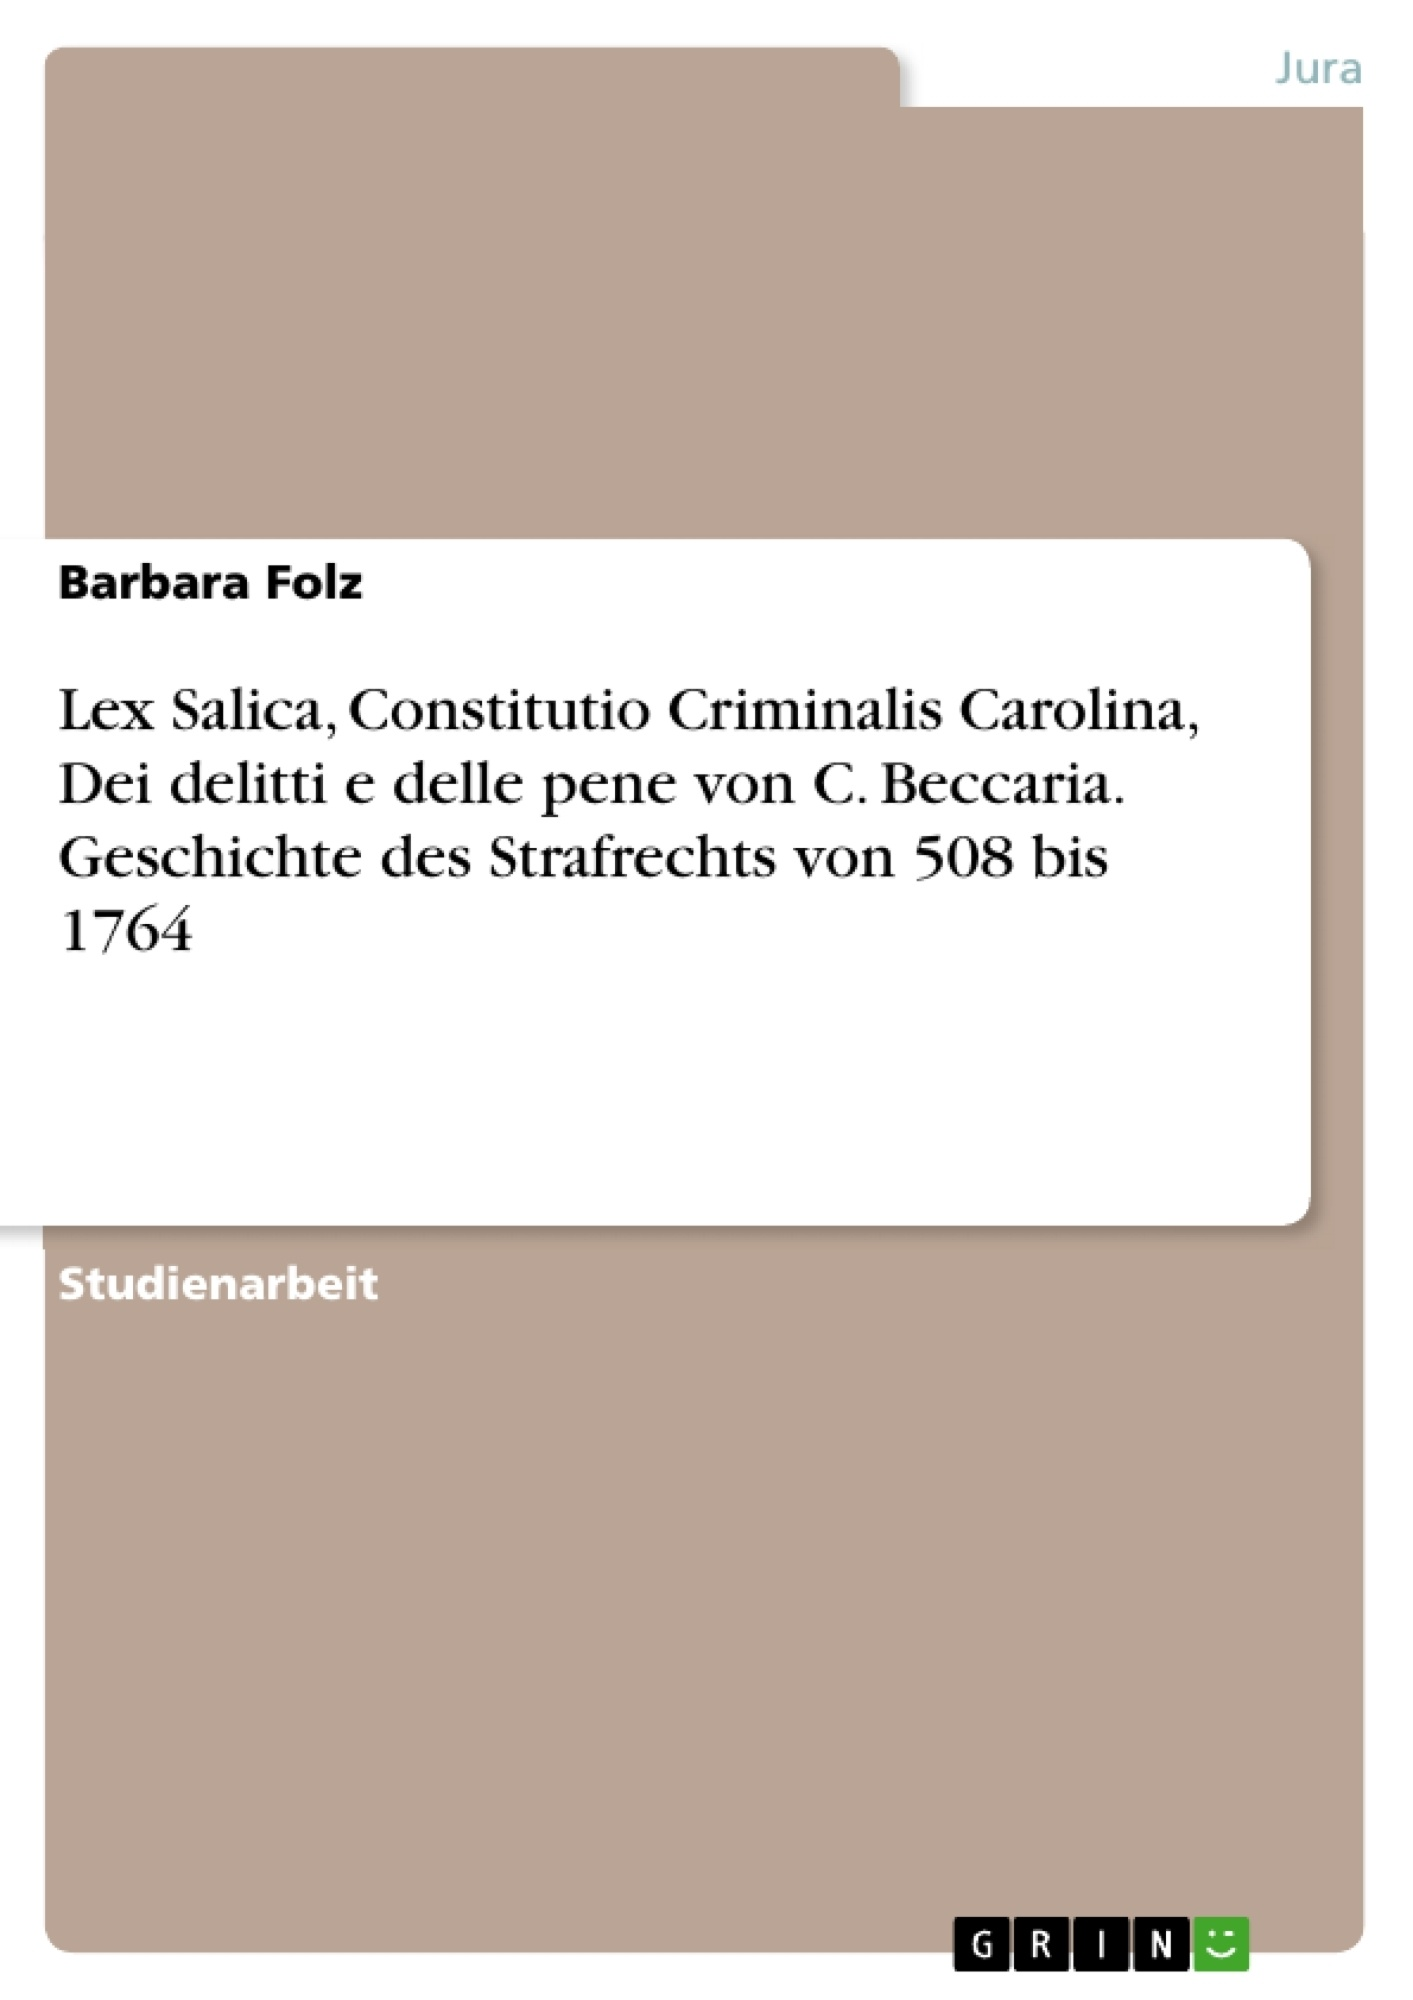 Titel: Lex Salica, Constitutio Criminalis Carolina, Dei delitti e delle pene von C. Beccaria. Geschichte des Strafrechts von 508 bis 1764